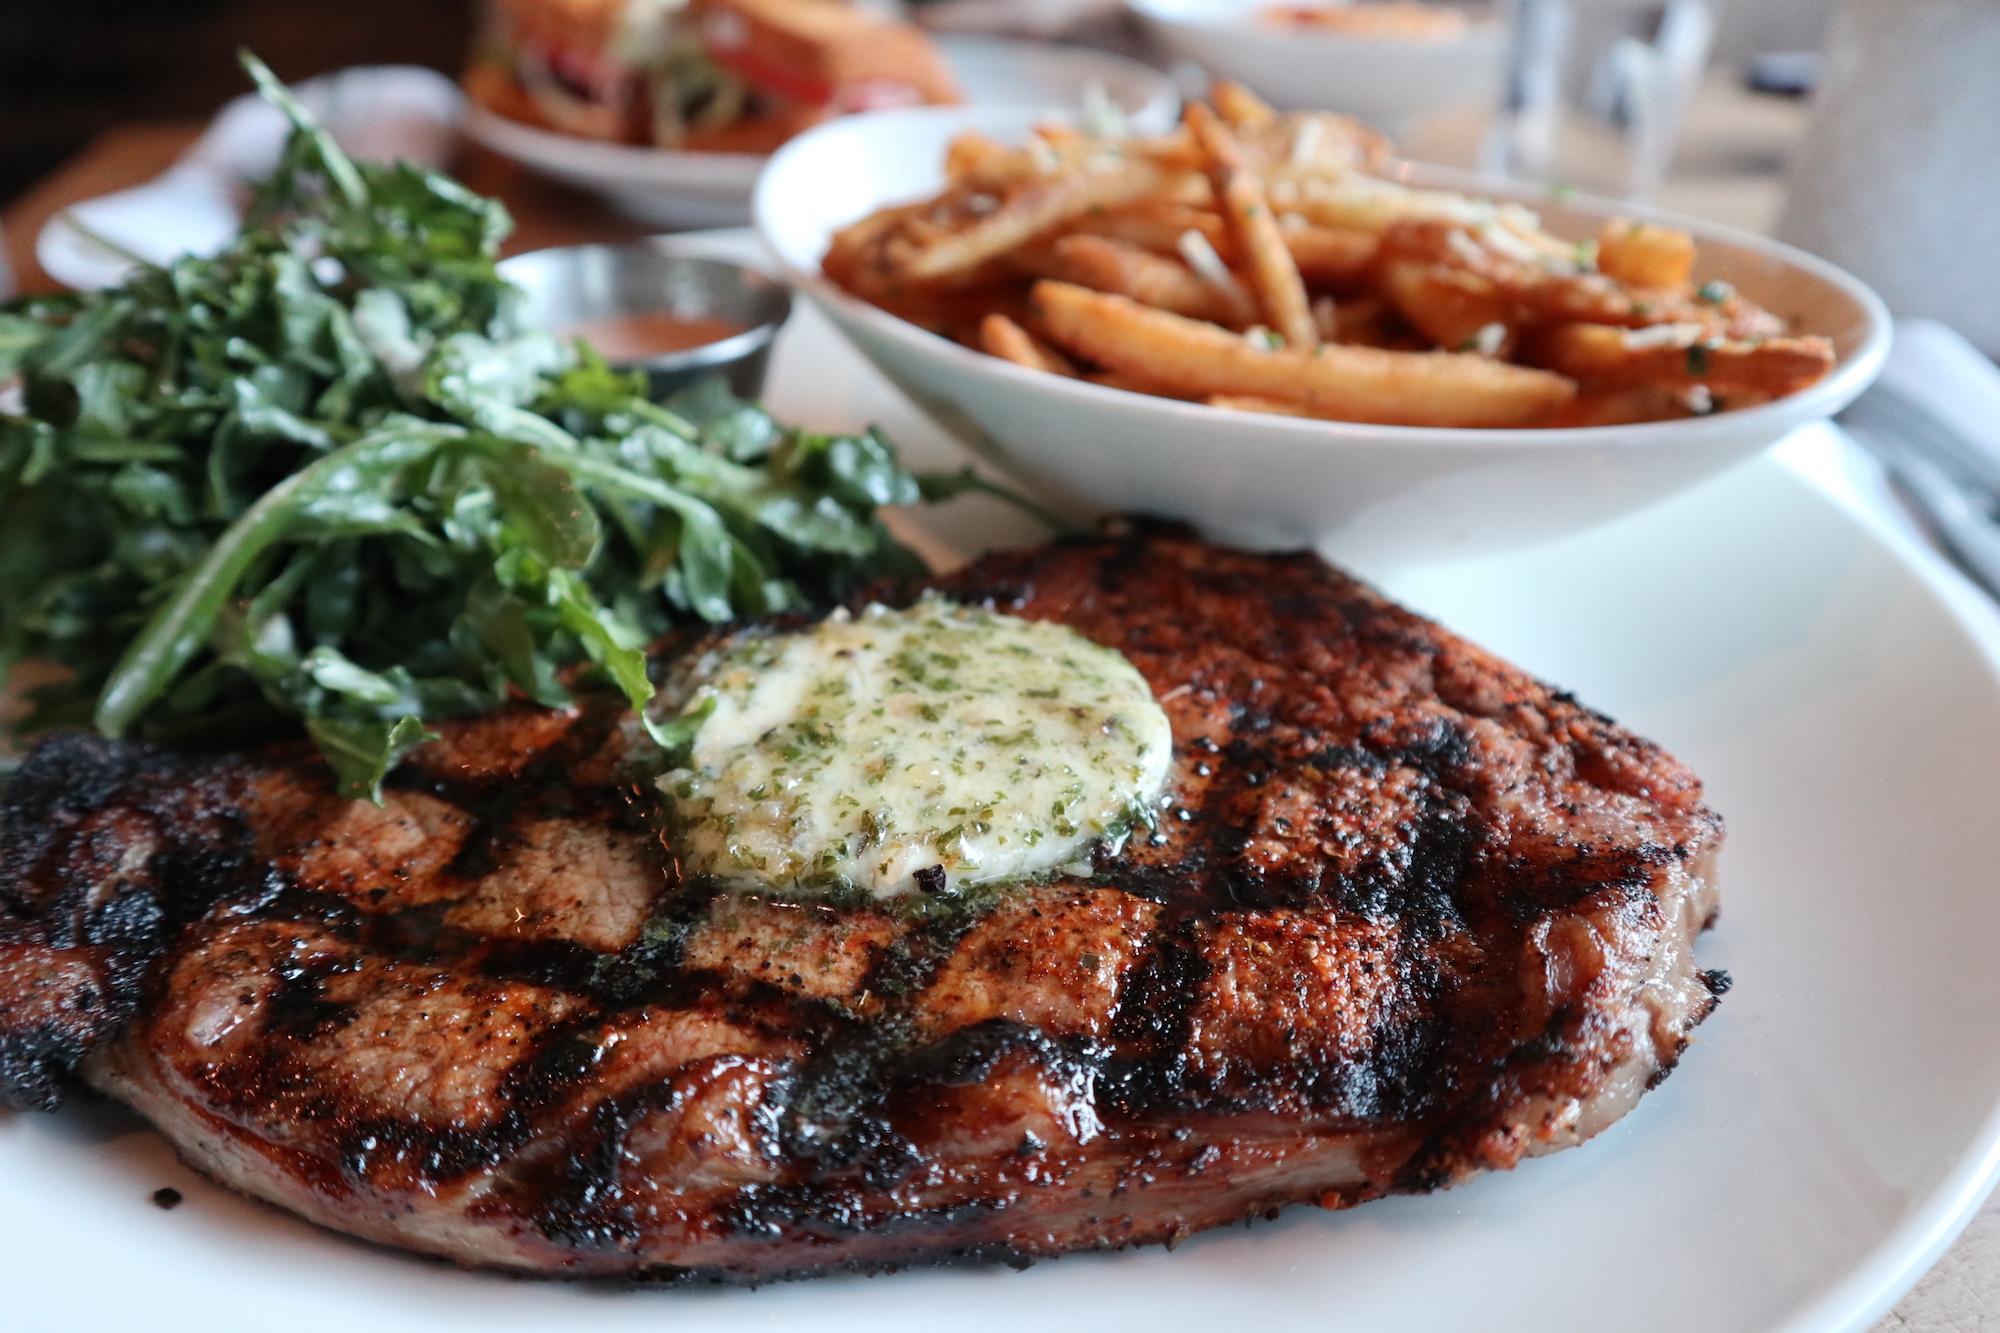 Steak Frites: Kansas City stirp, bearnaise butter, arugula salad, truffle fries